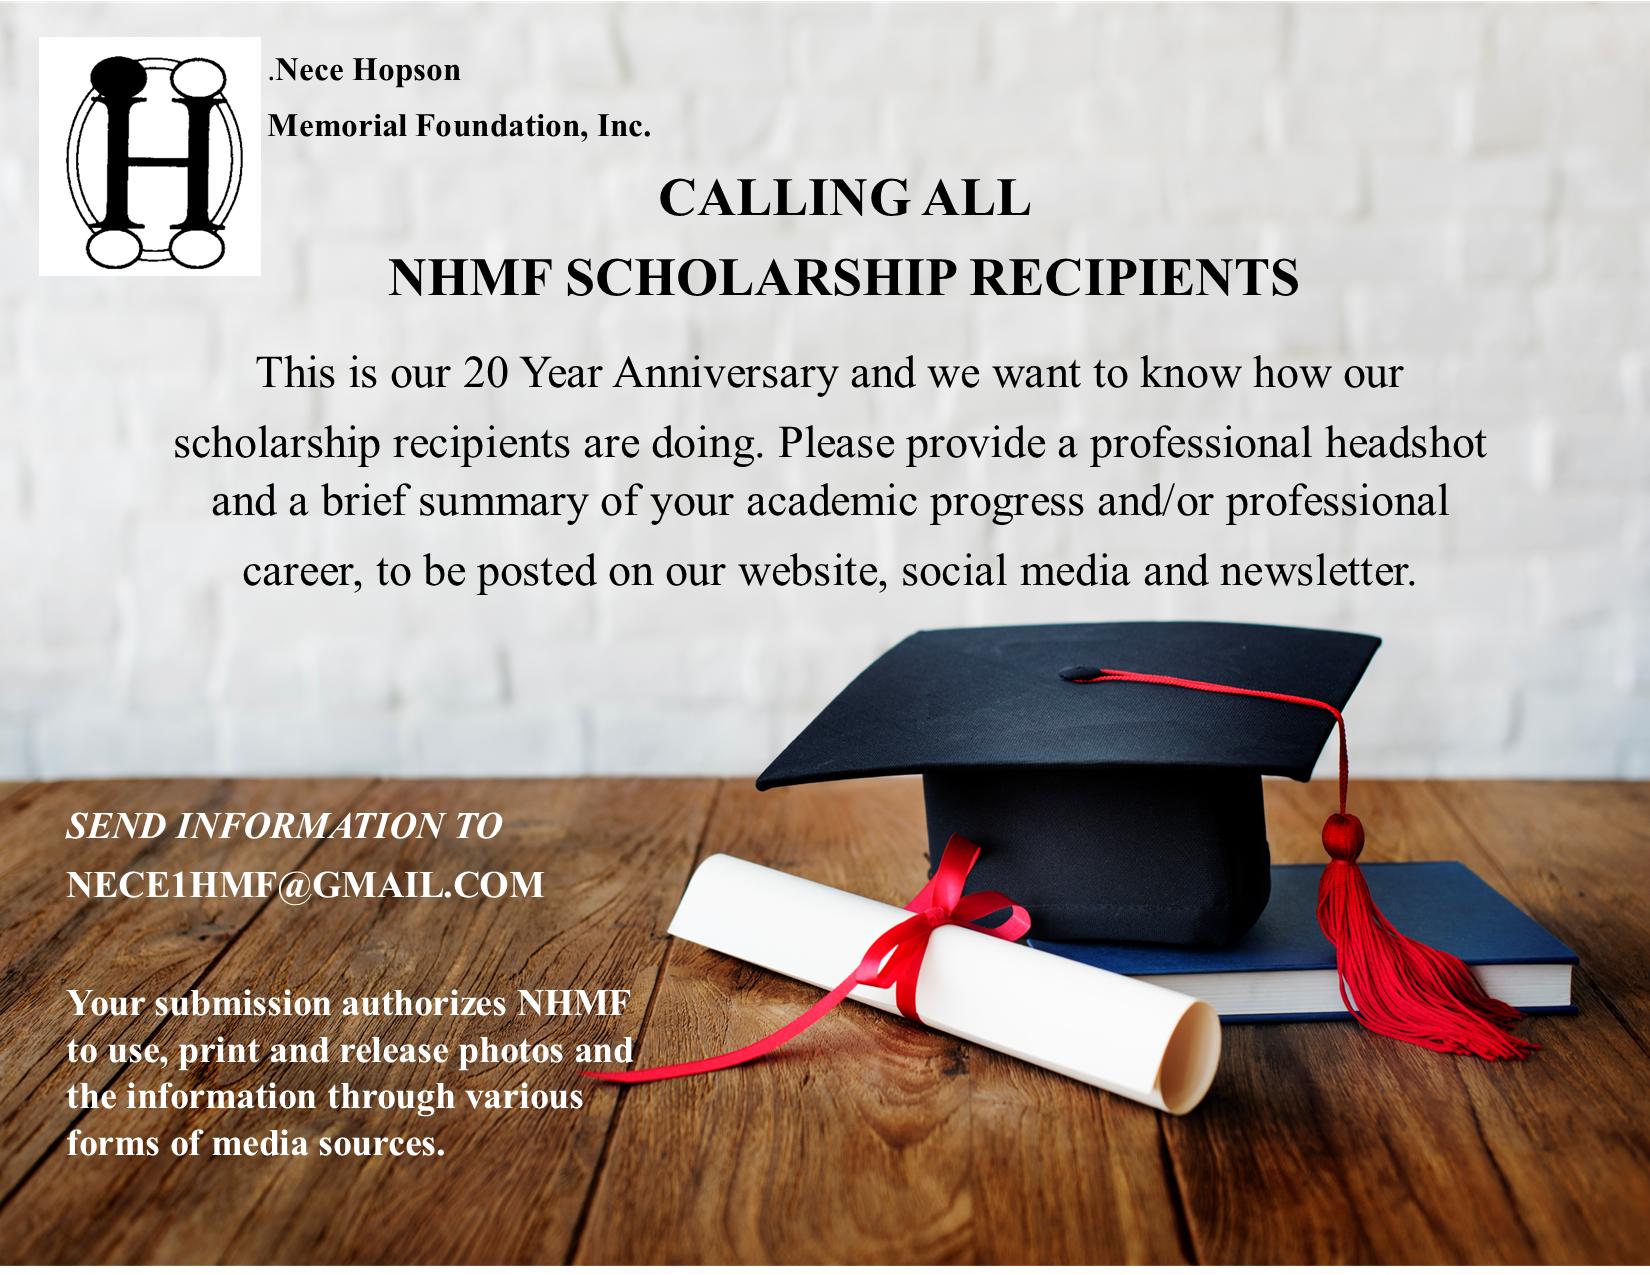 Calling All NHMF Scholarship Recipients! Nece Hopson Memorial Foundation Event